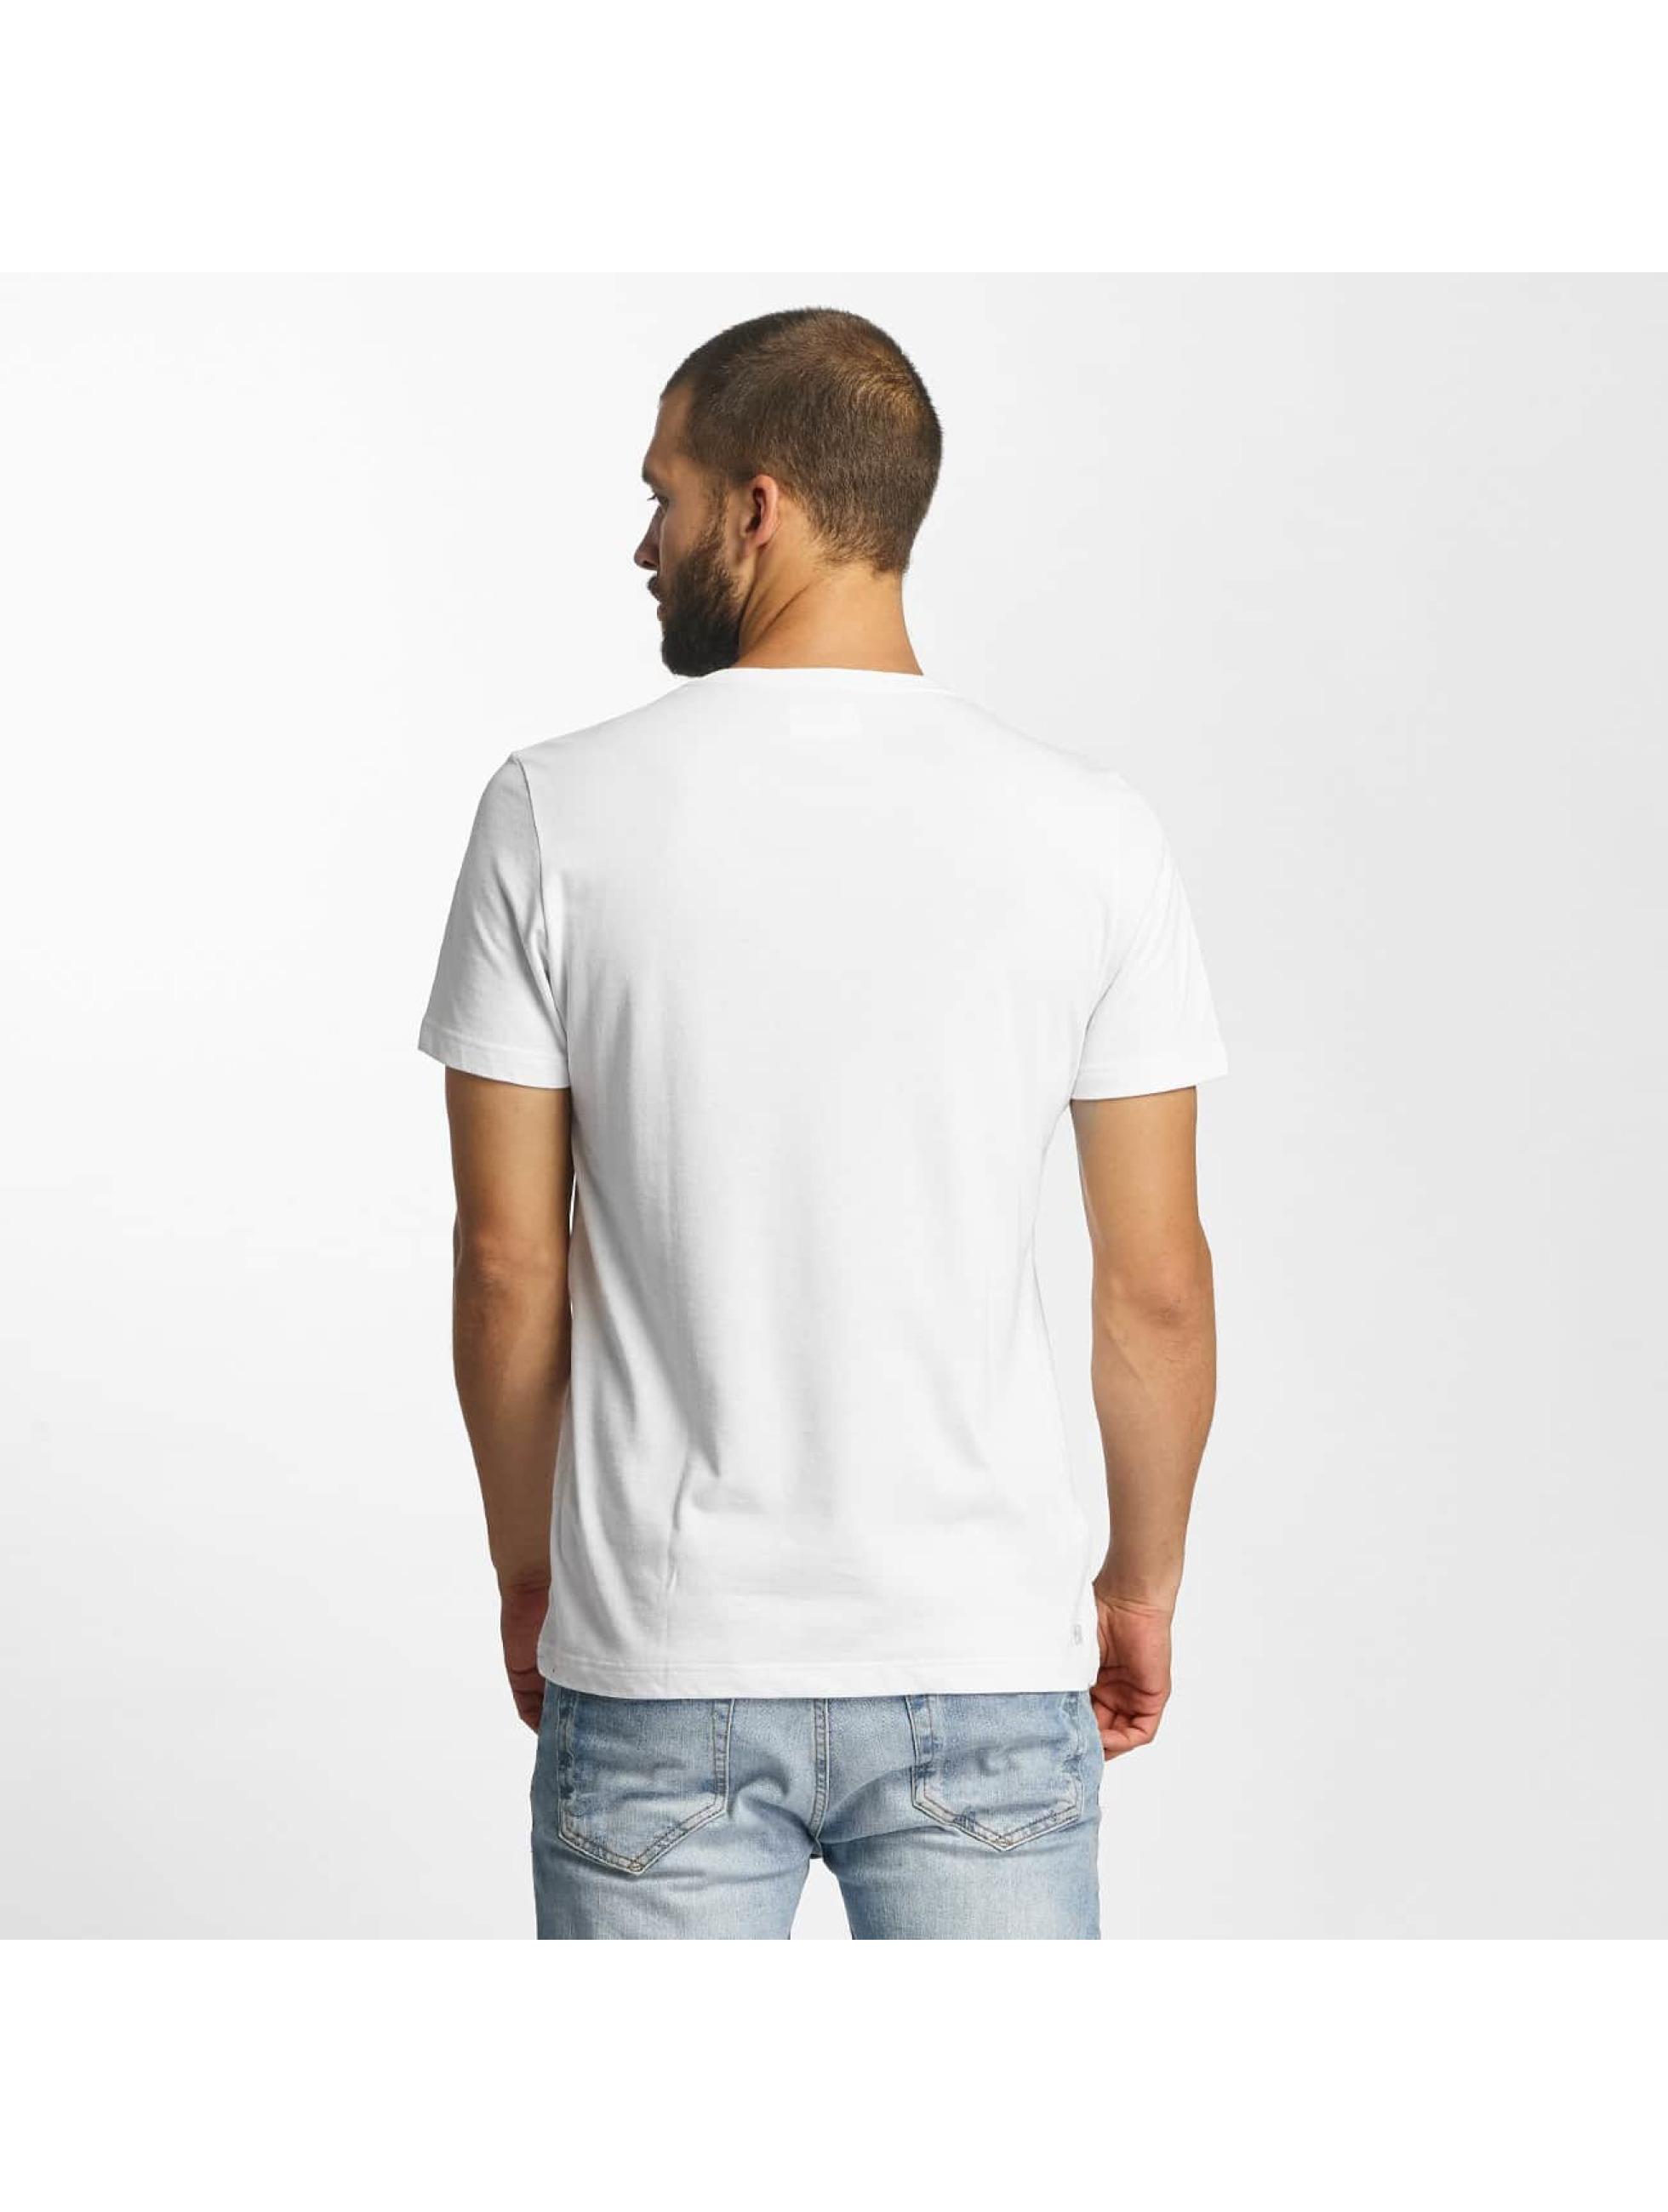 Lacoste T-Shirt Kroko white